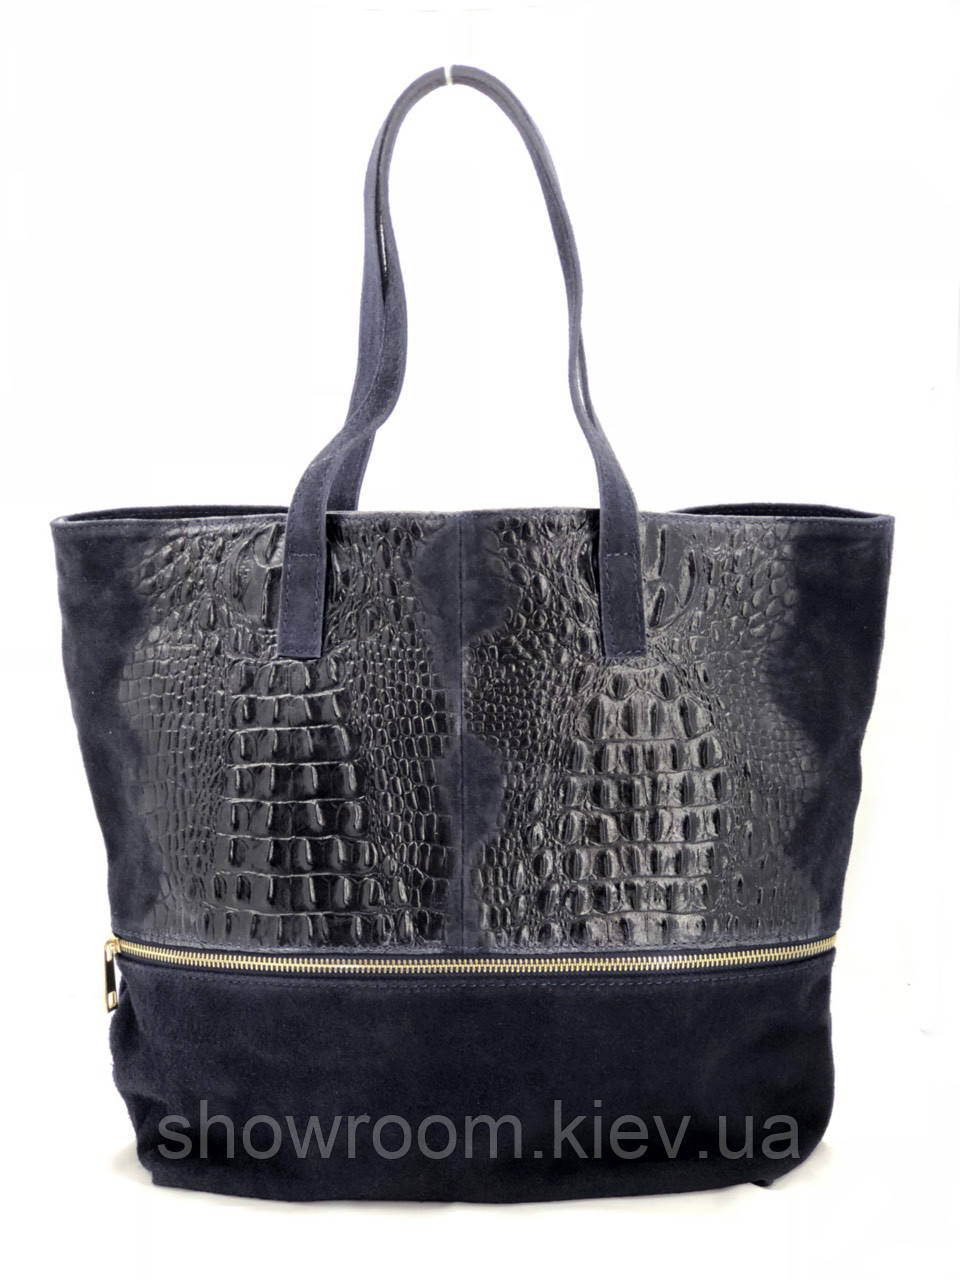 6118d1134721 Сумка шоппер женская Vera Pelle (TS 80) кожаная темно синяя: продажа ...